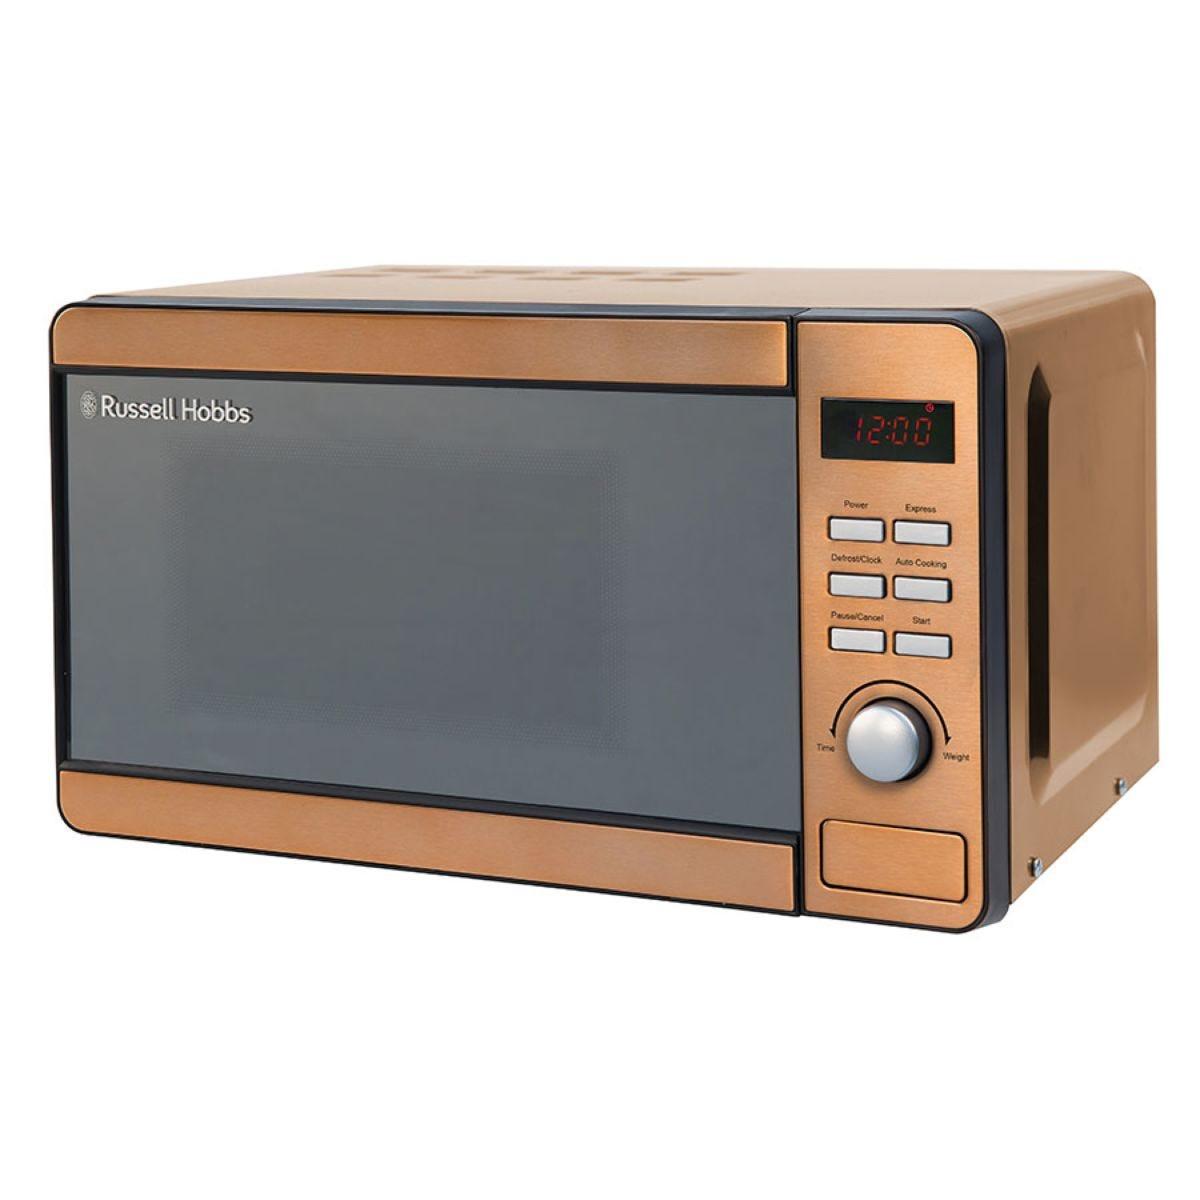 Russell Hobbs RHMM804CP 800W 17L Digital Microwave - Copper